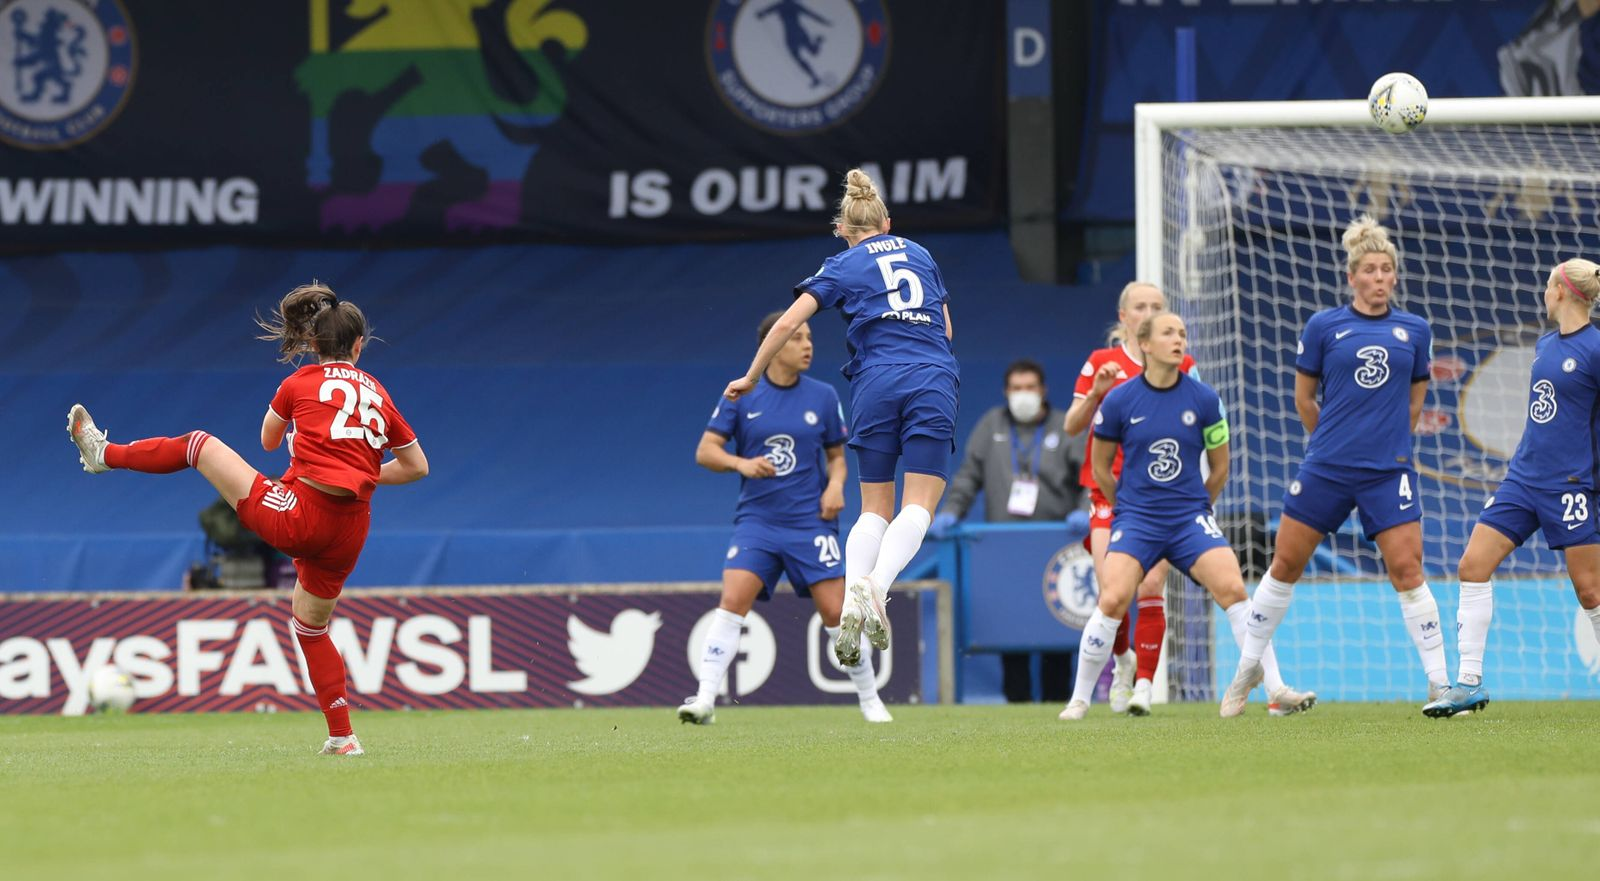 Kington Upon Thames, England, 2nd May 2021. Sarah Zadrazil of Bayern Munich scores the equalising goal during the UEFA